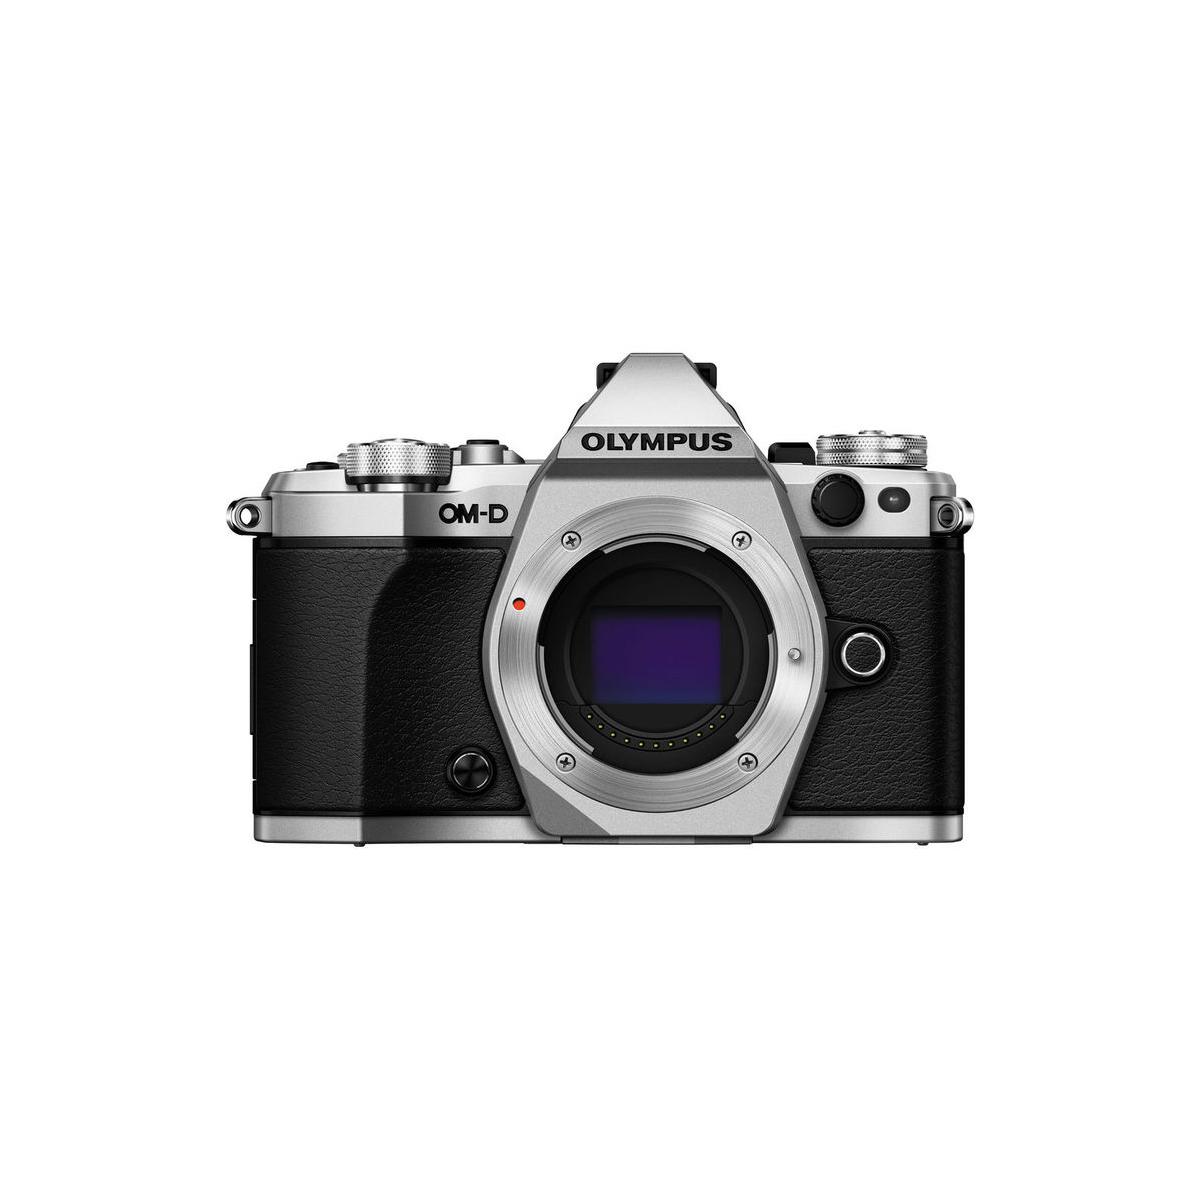 Olympus OM-D E-M5 Mark II Mirrorless Digital Camera (Body Only, Silver)